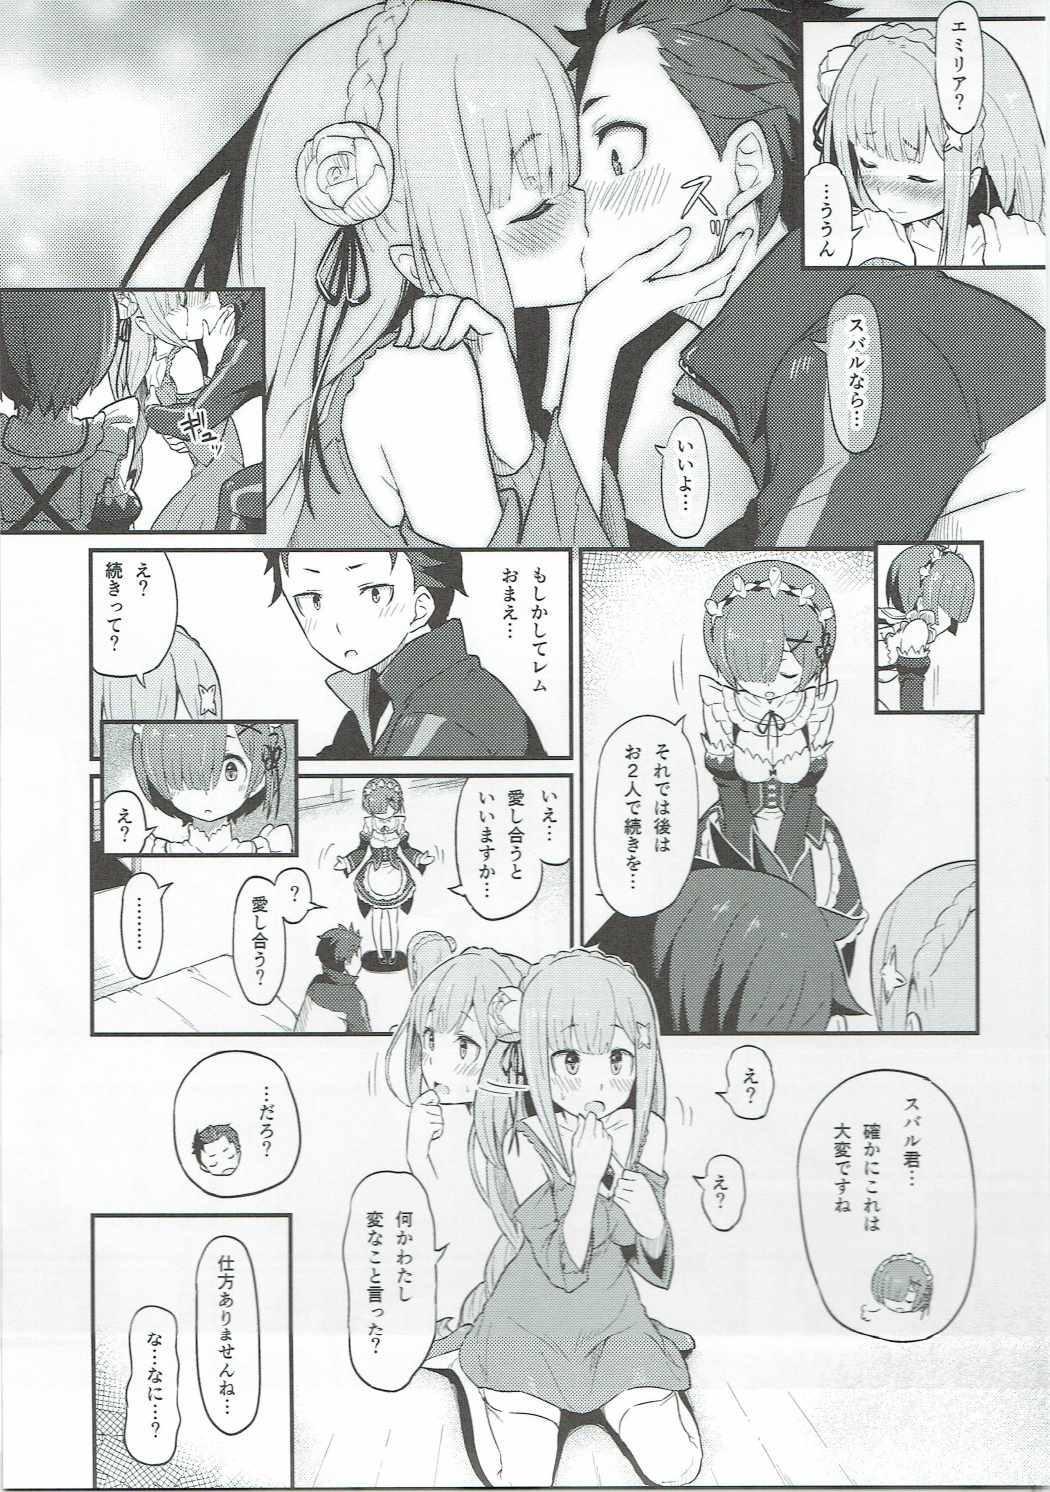 Rem no Emilia Kuttsuke Daisakusen 11